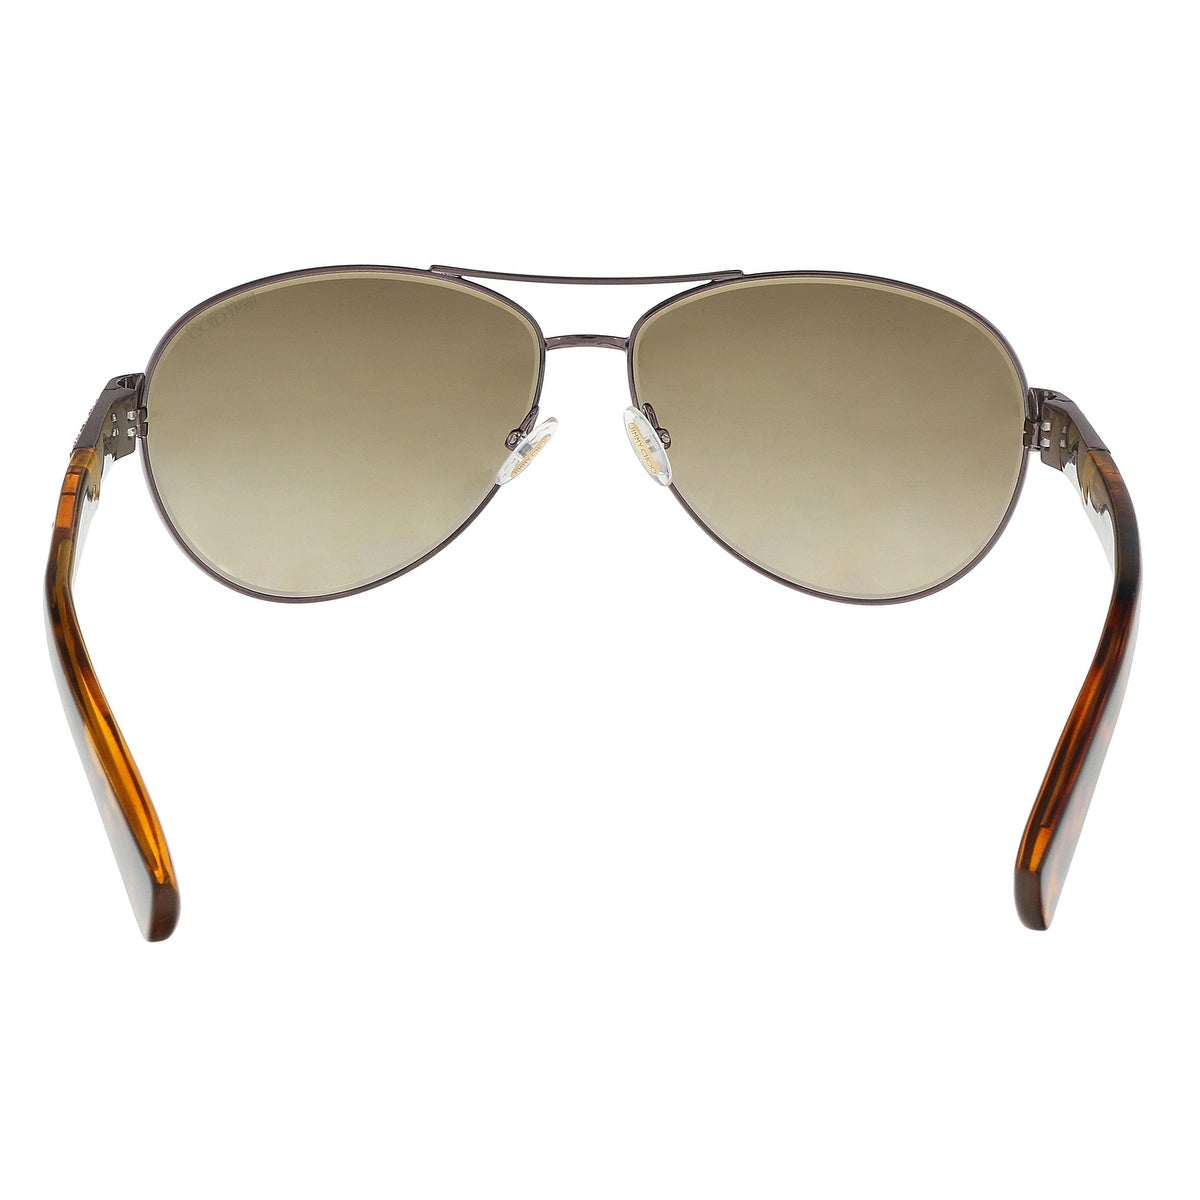 189b39c76cd13 Shop Jimmy Choo BABA S 0VUT Shiny Bronze Aviator Sunglasses - 59-13-135 -  Free Shipping Today - Overstock - 21158380